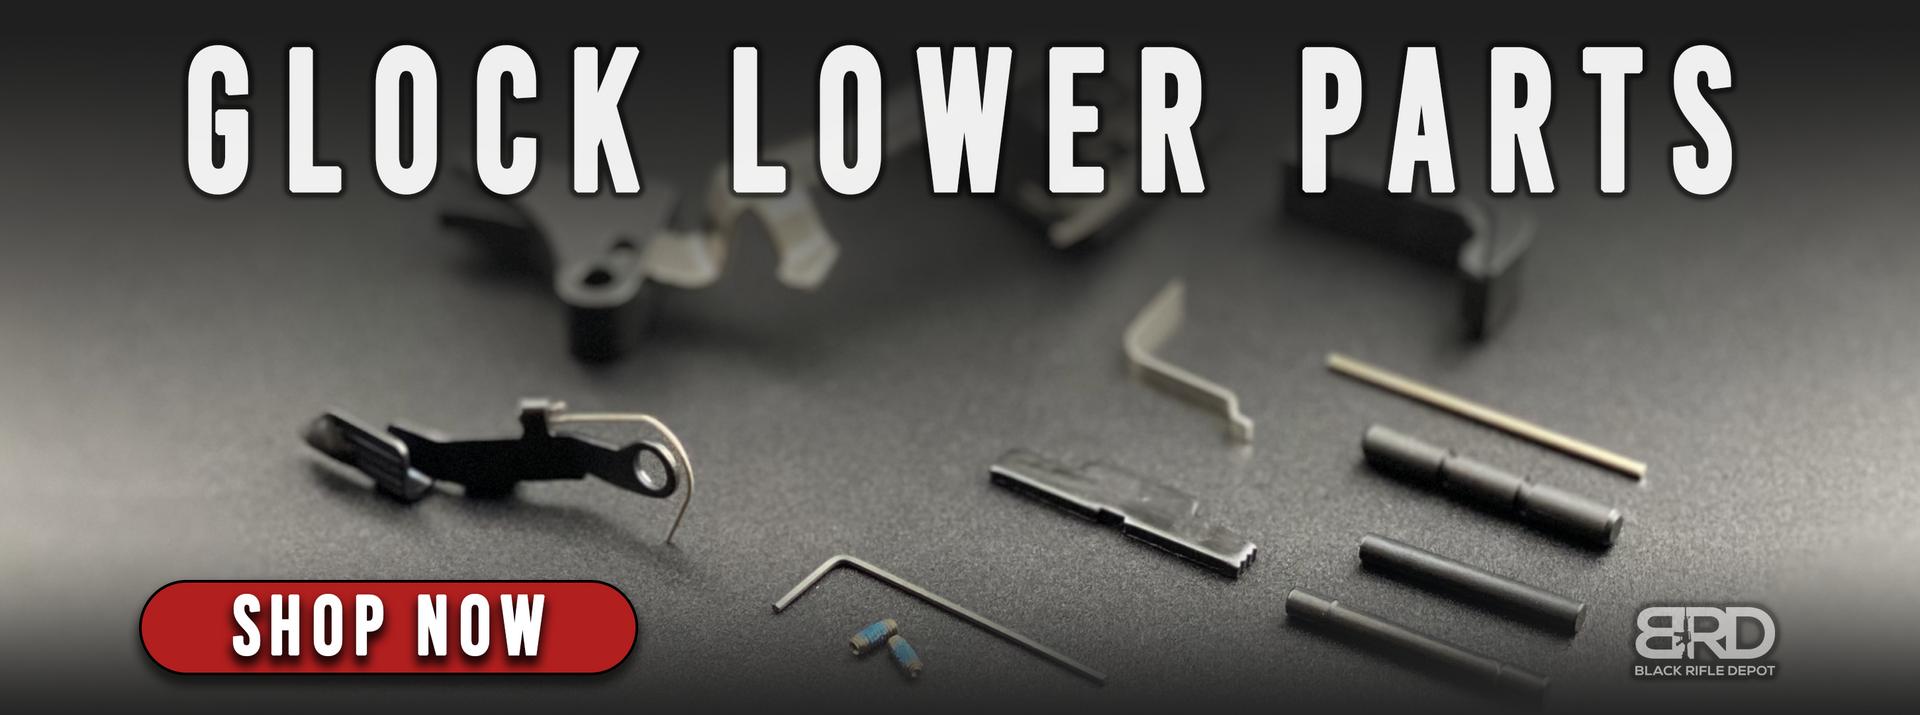 glock parts kits, glock parts